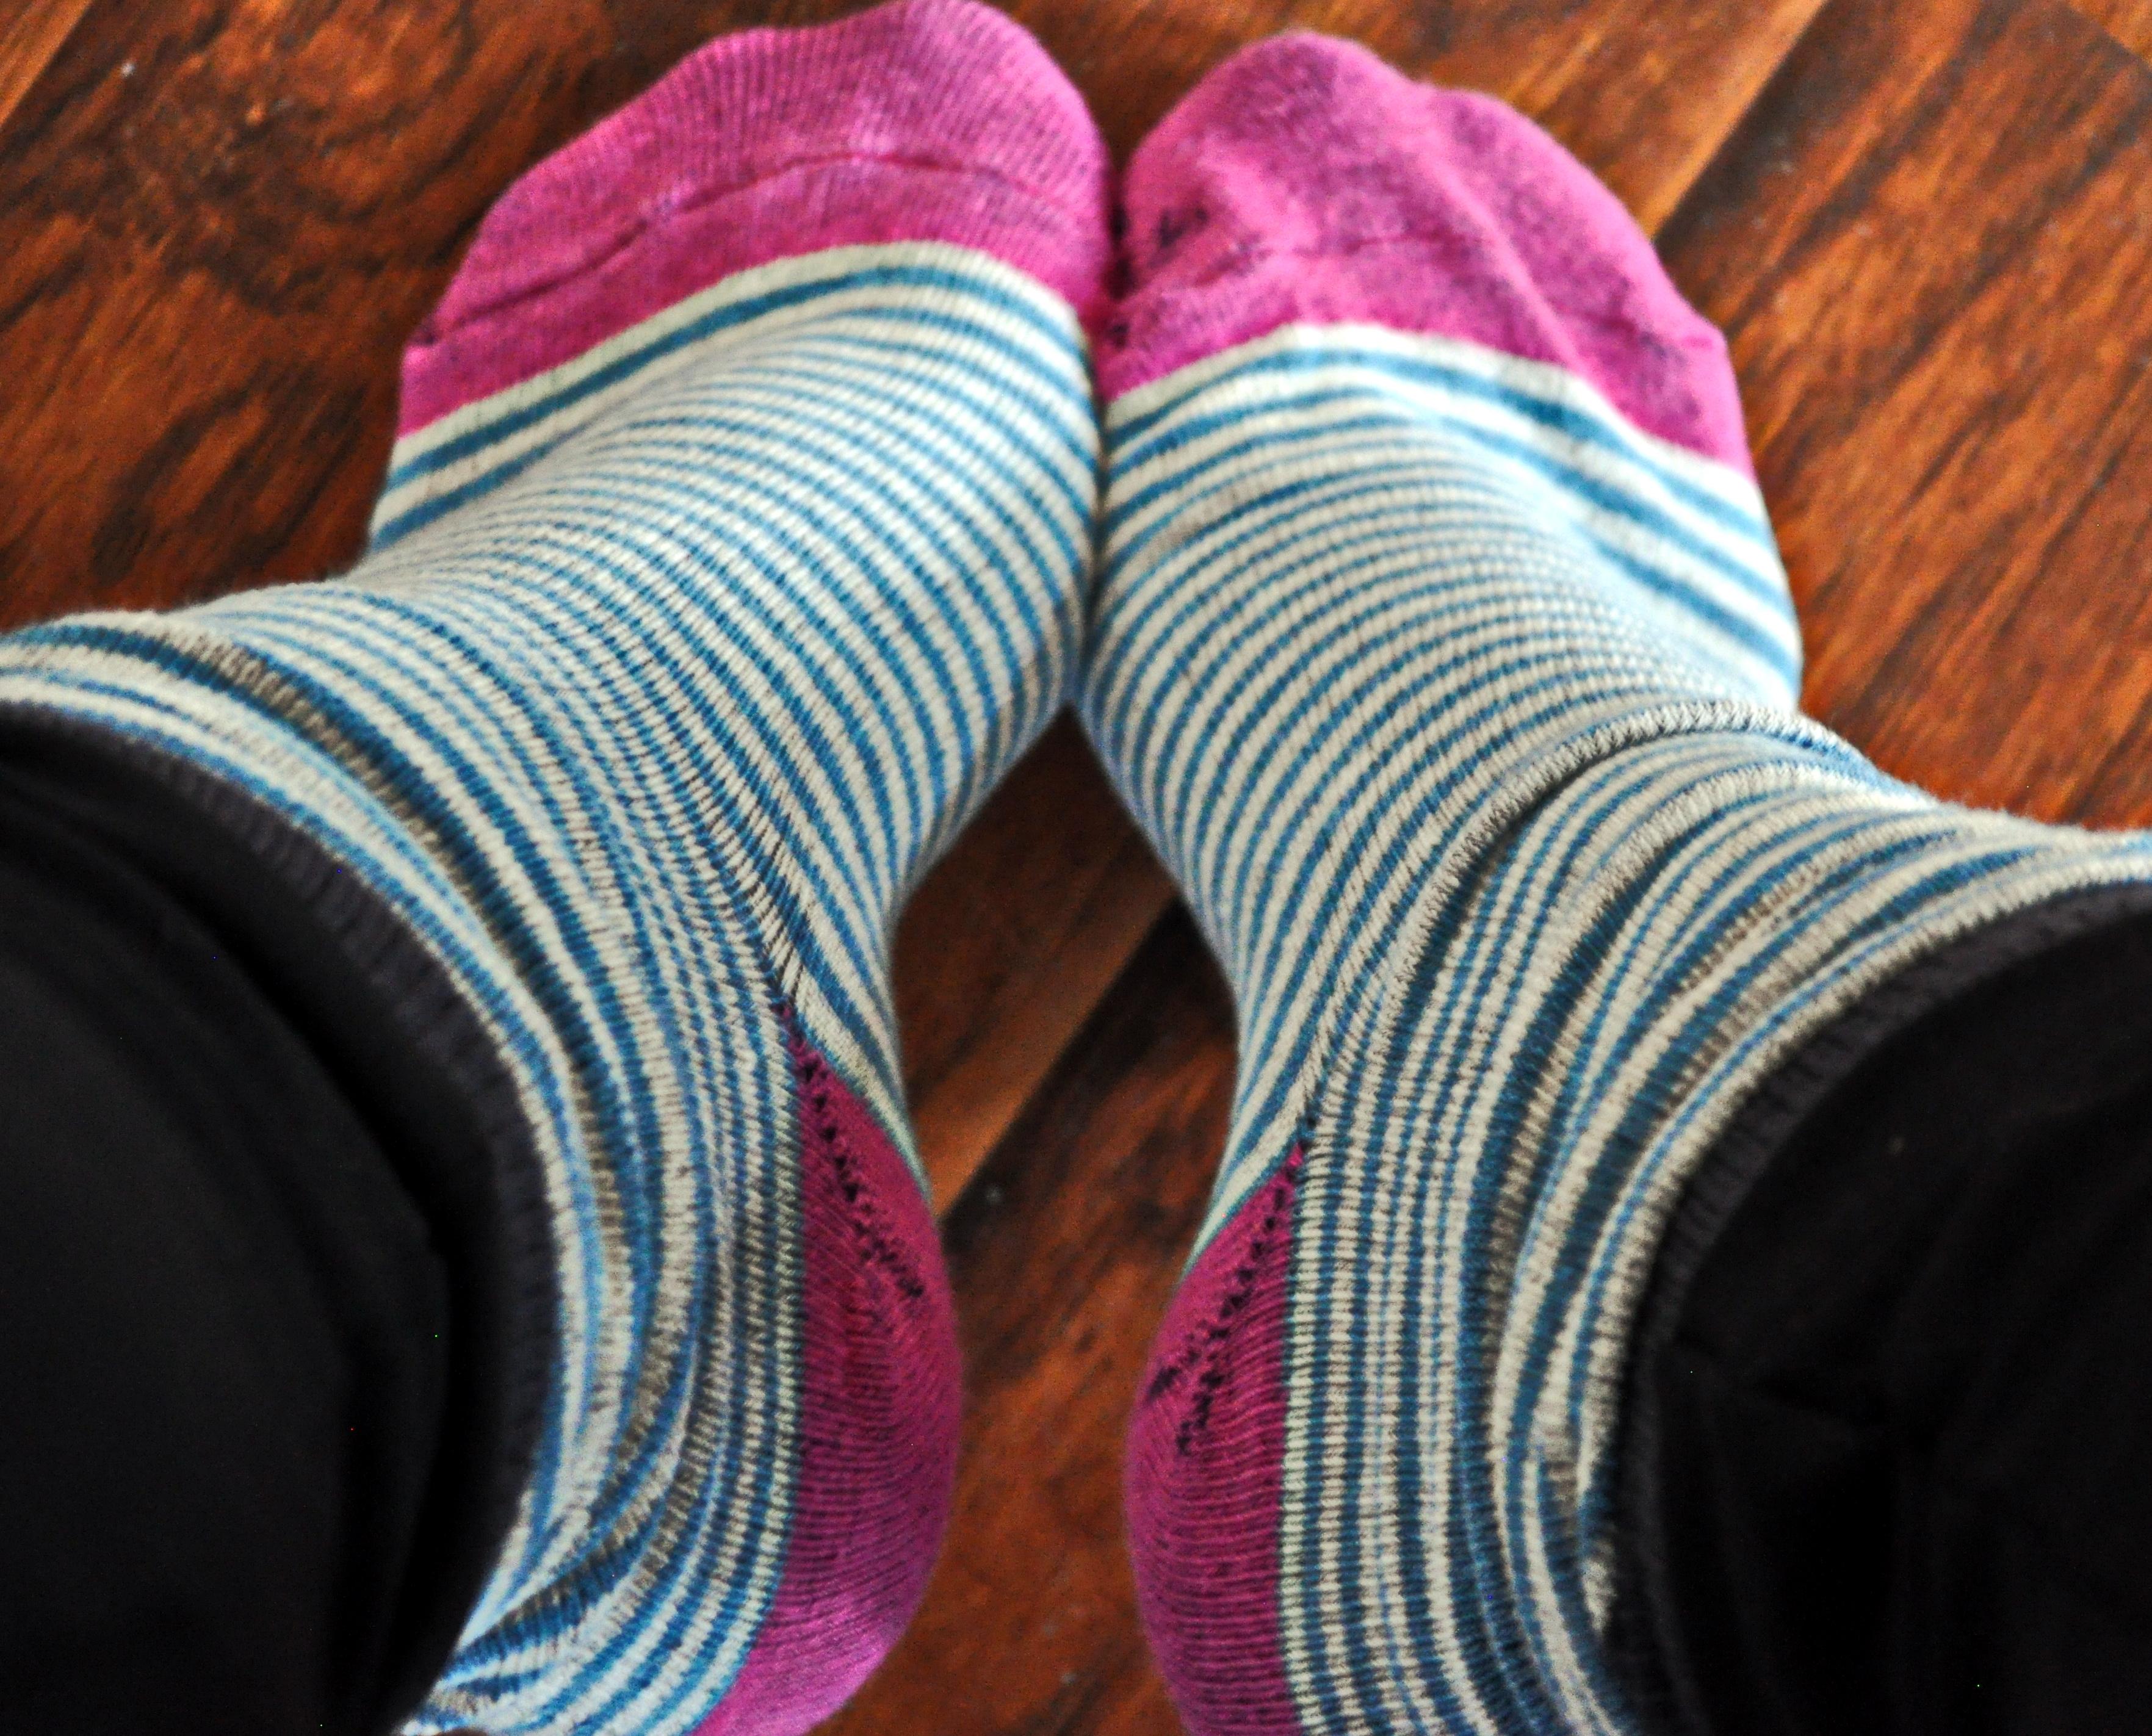 Cozy Reader Club April 2016 Socks